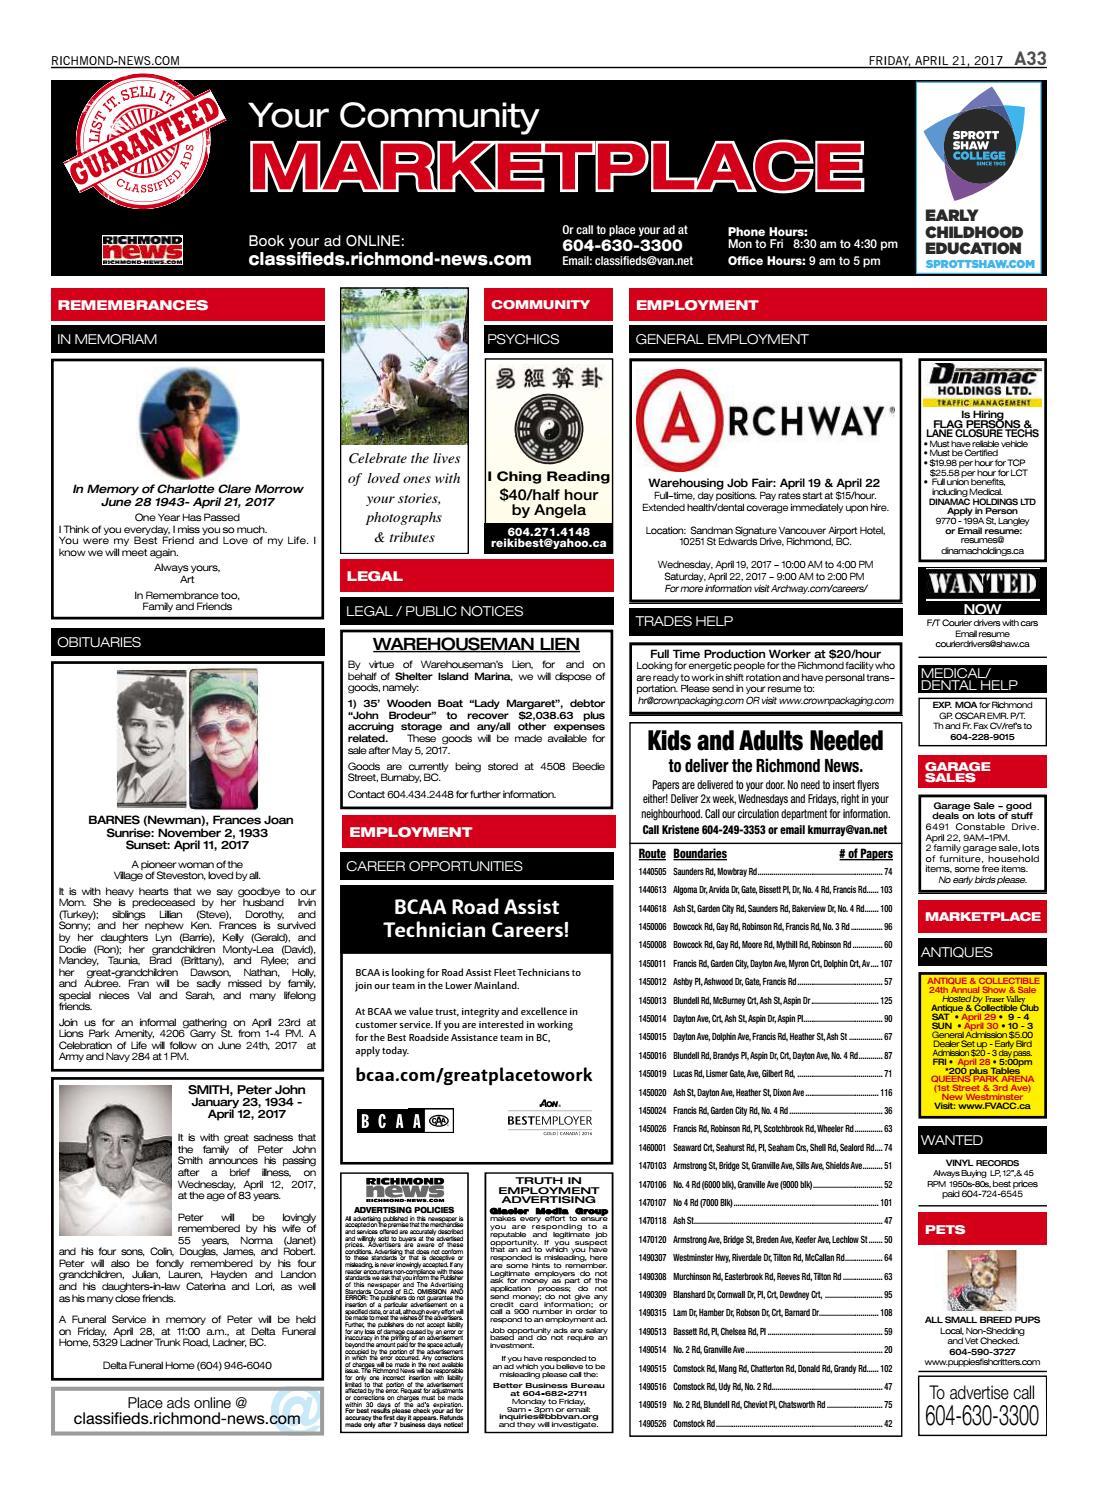 Richmond News April 21 2017 by Richmond News - issuu